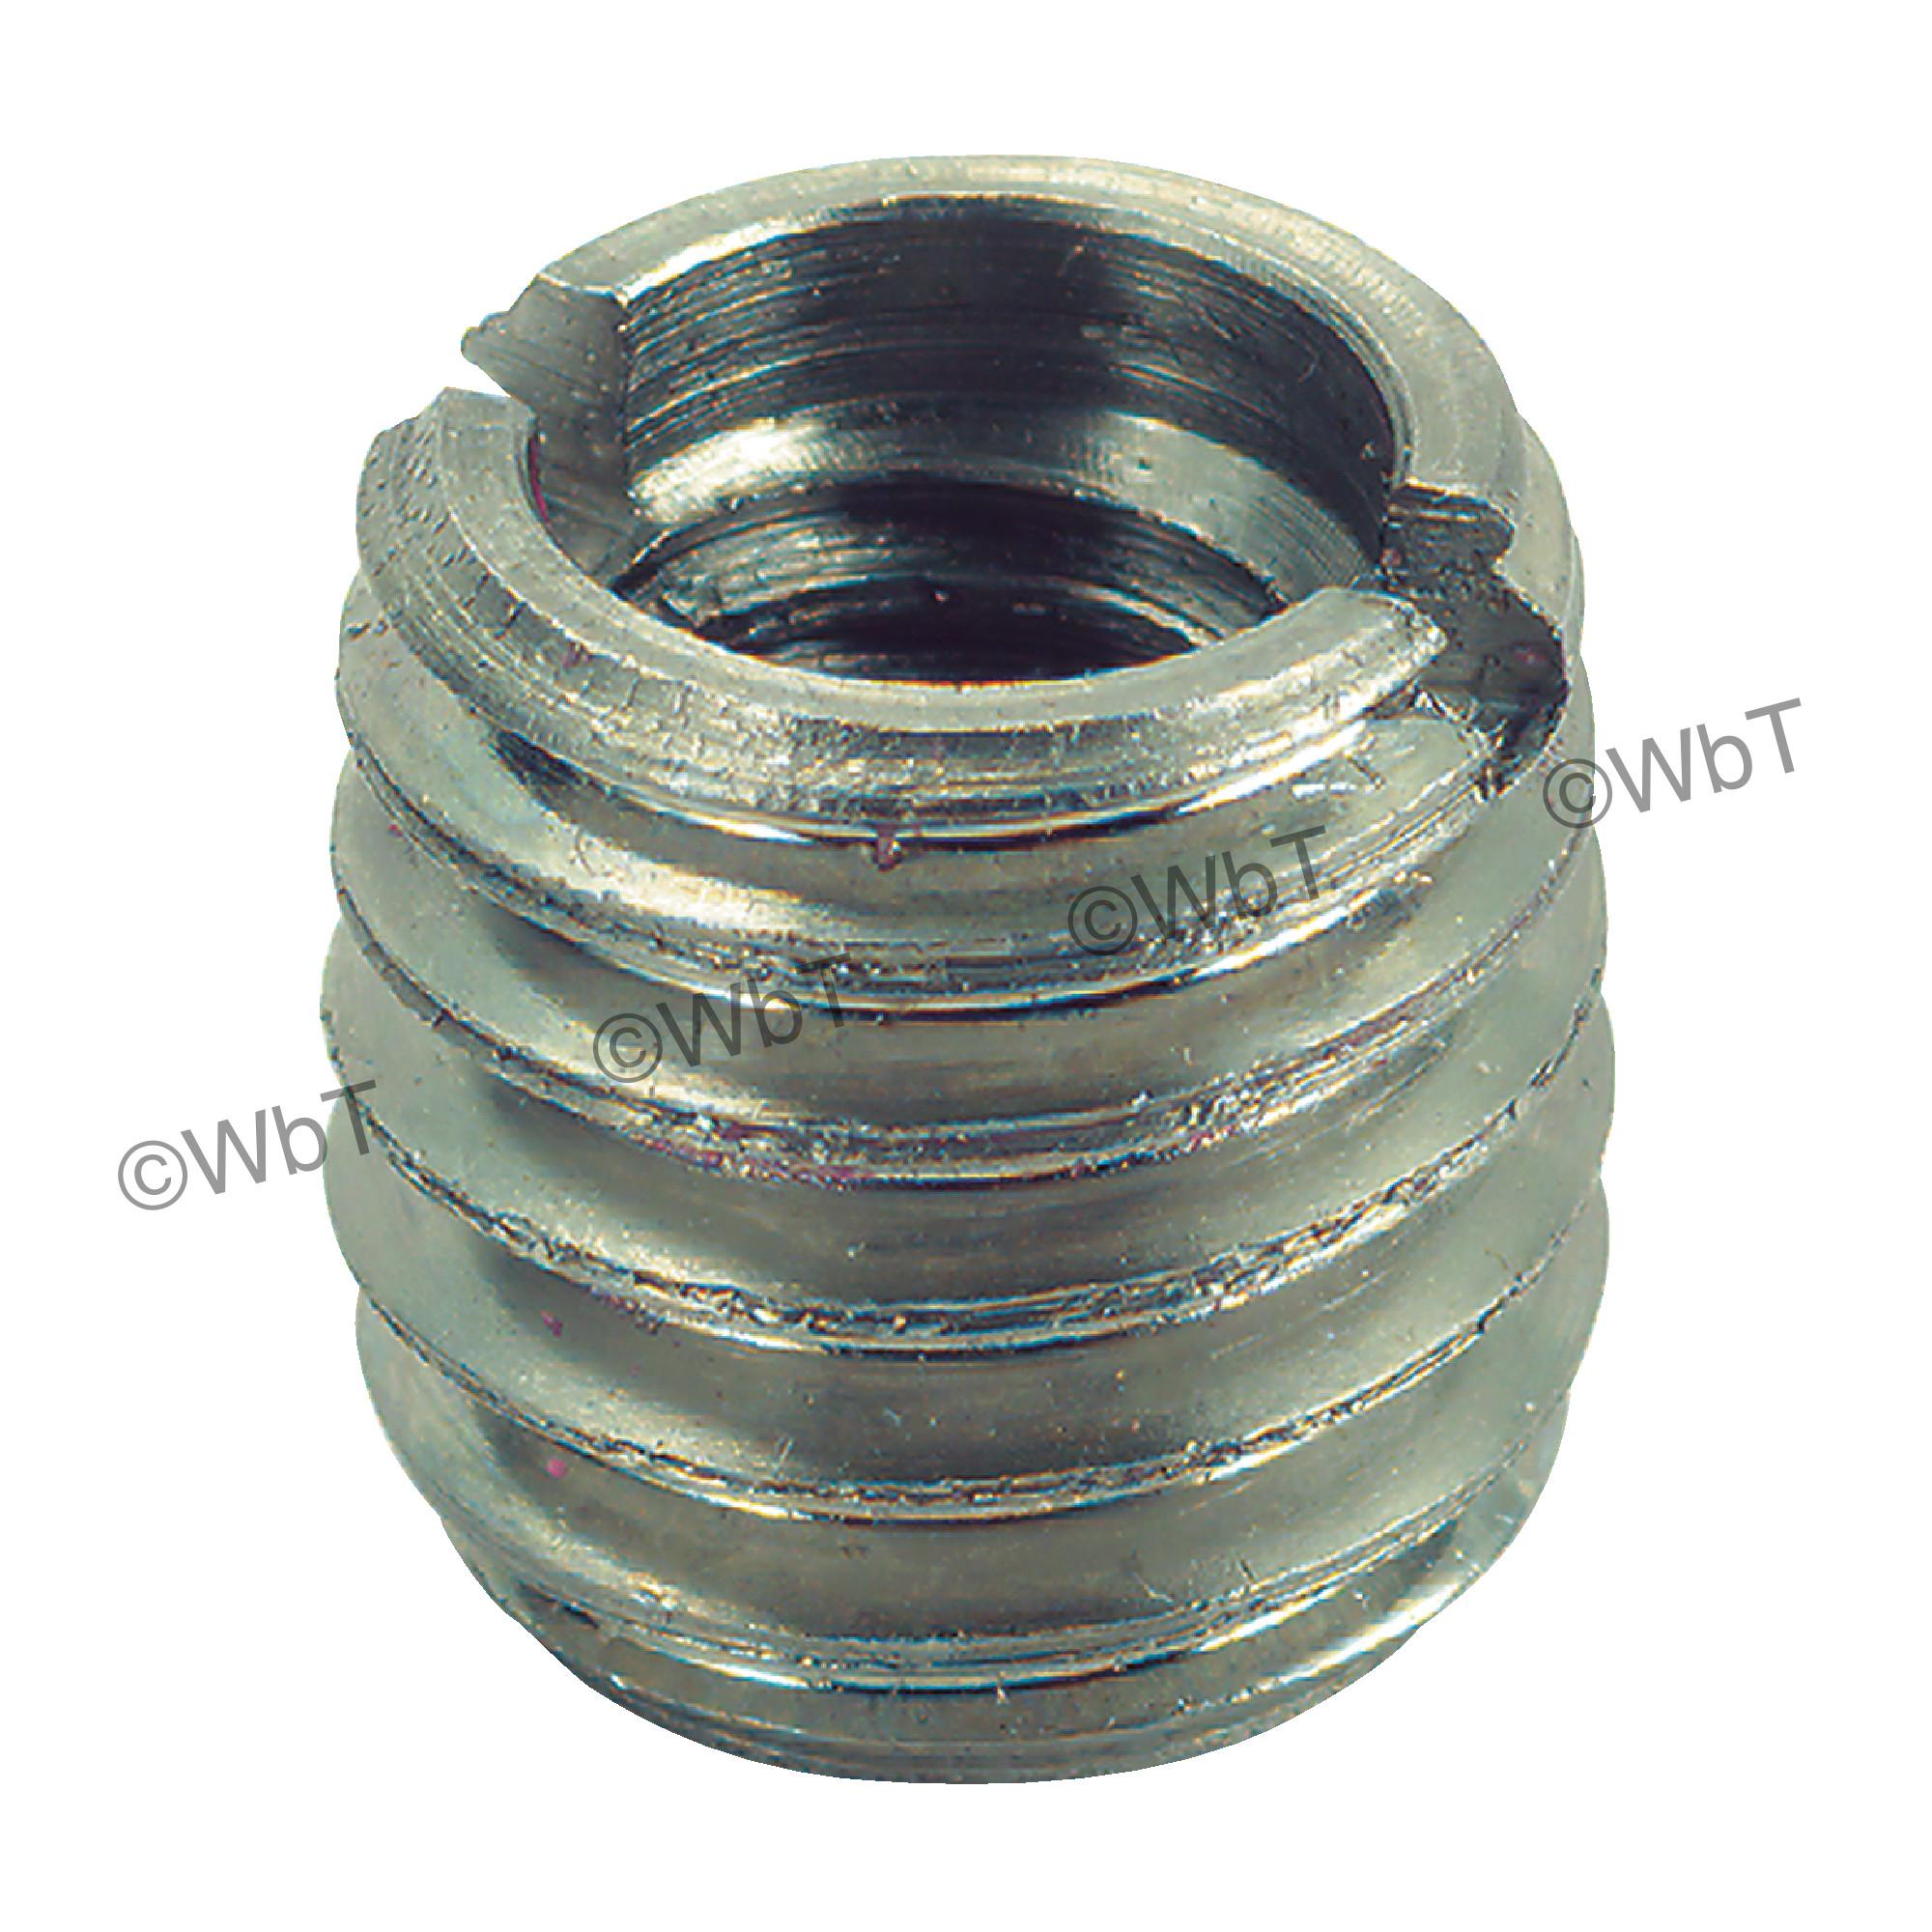 303 Stainless Steel Thread Insert